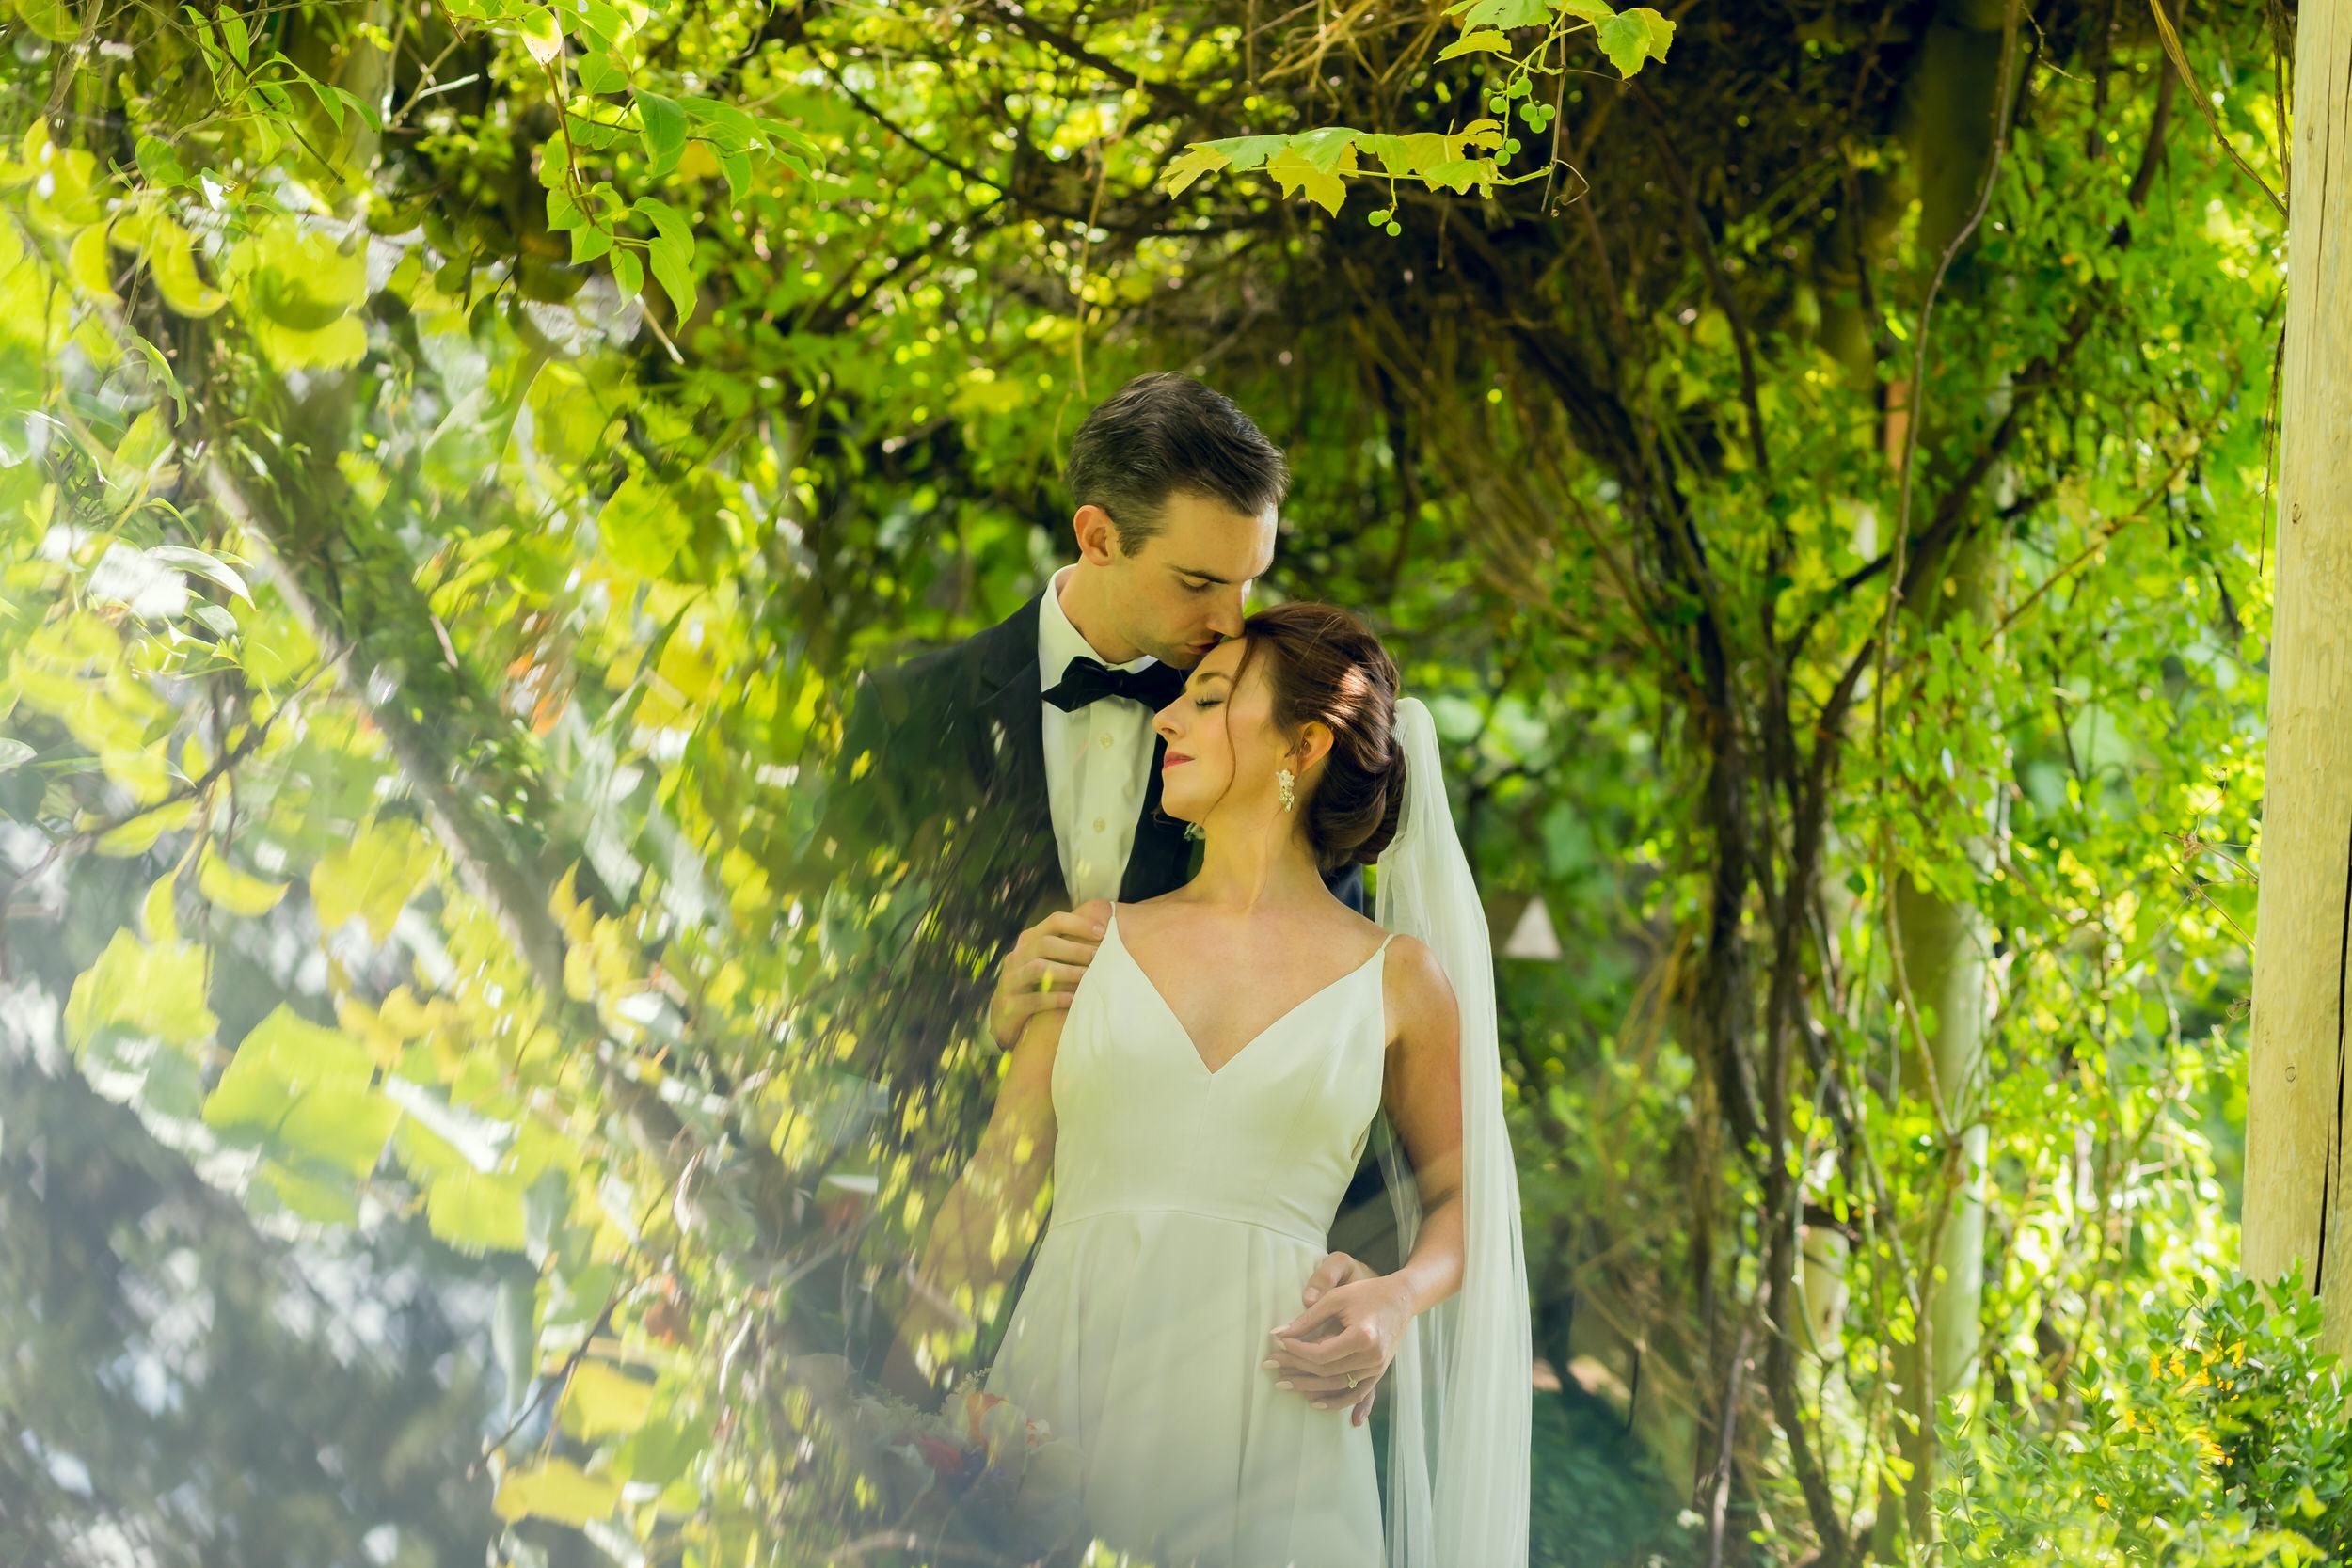 mthoodorganicfarms_wedding_BK015_starkphotography